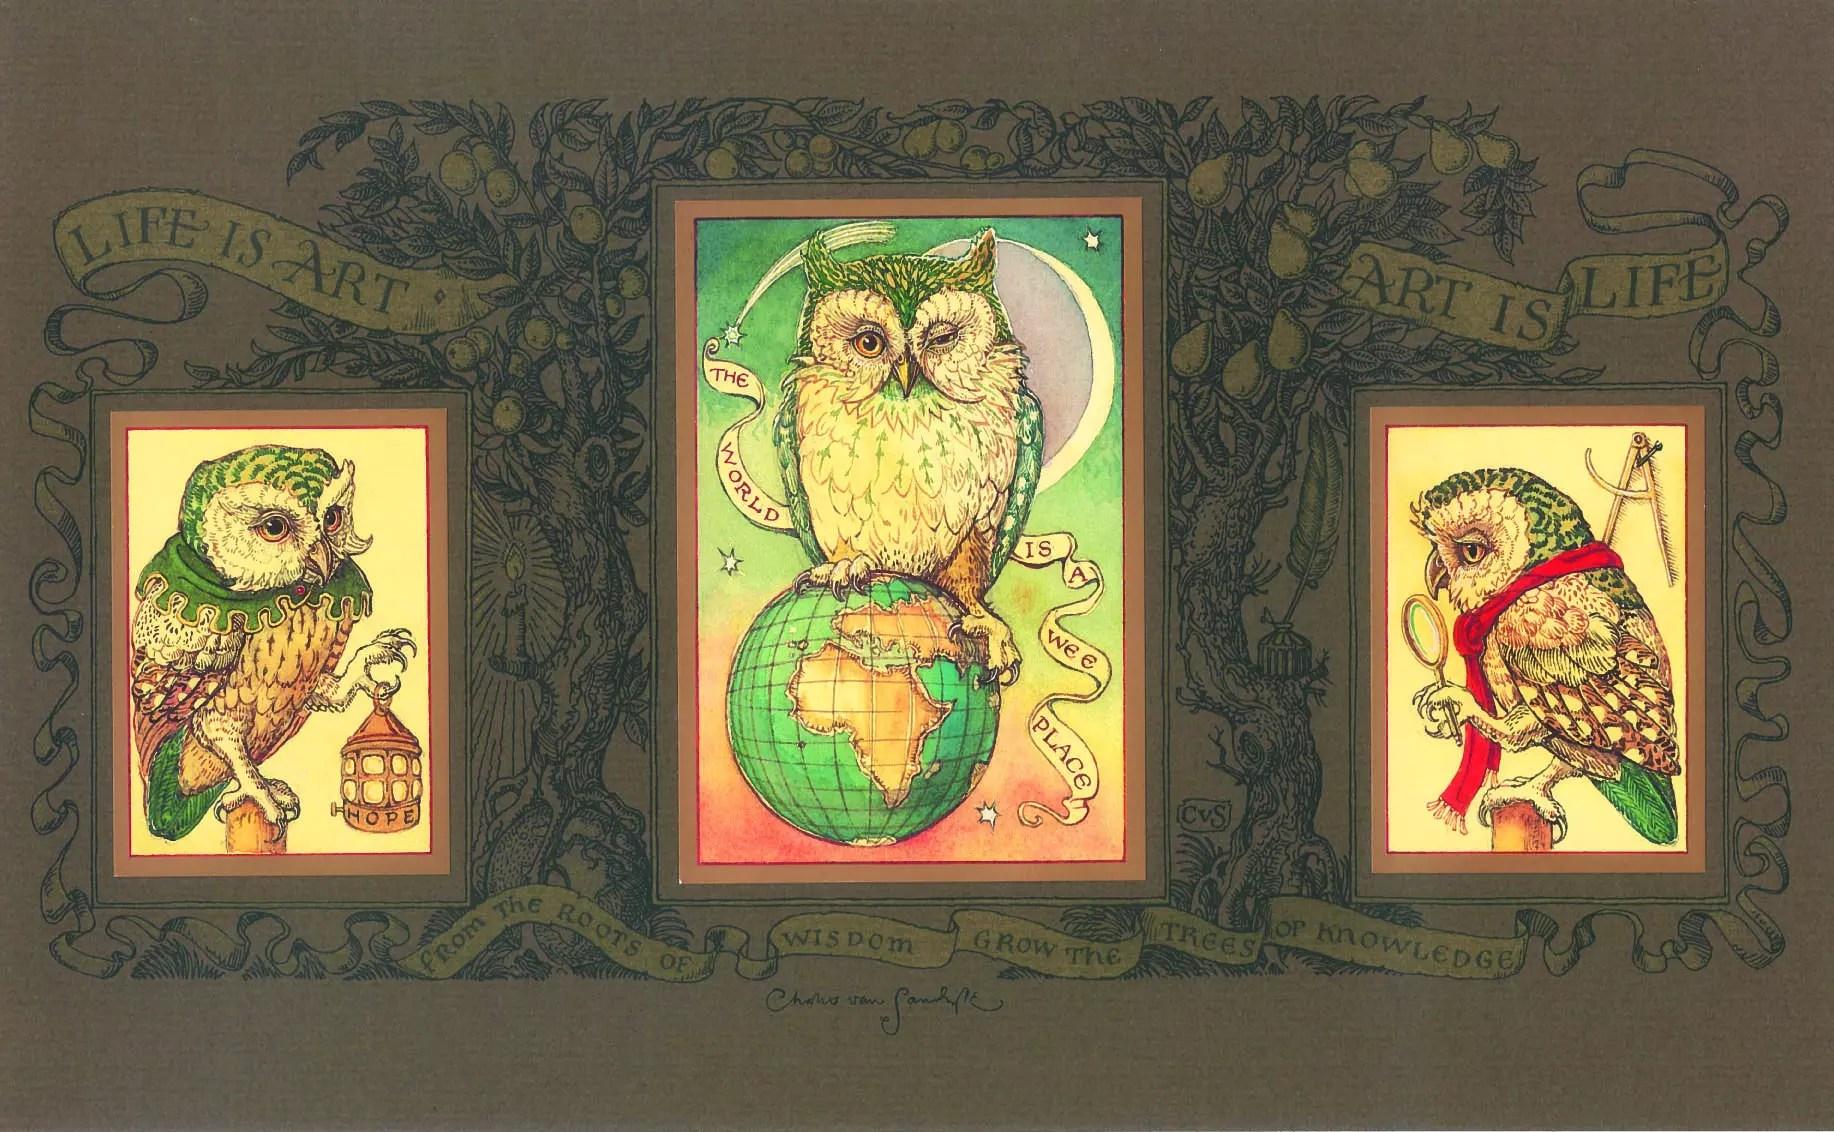 1997 Life is Art owl triptych